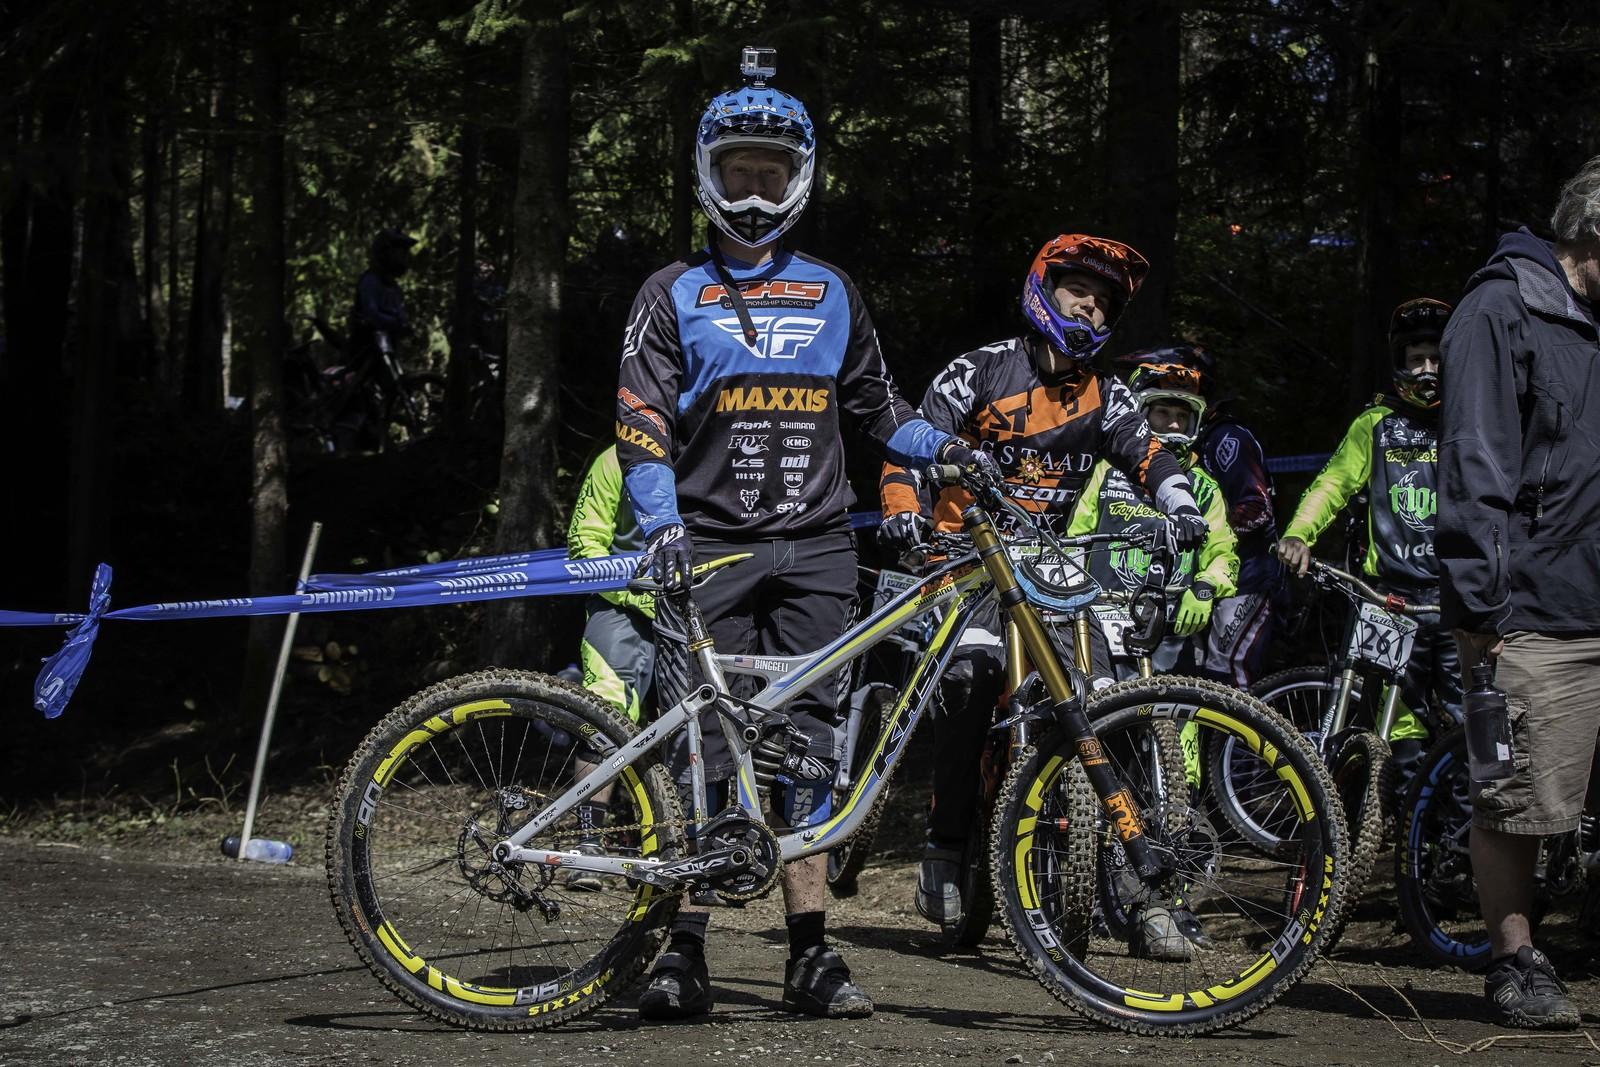 Logan Binggeli Running Singlespeed DH at Port Angeles - PIT BITS - Port Angeles ProGRT - Mountain Biking Pictures - Vital MTB